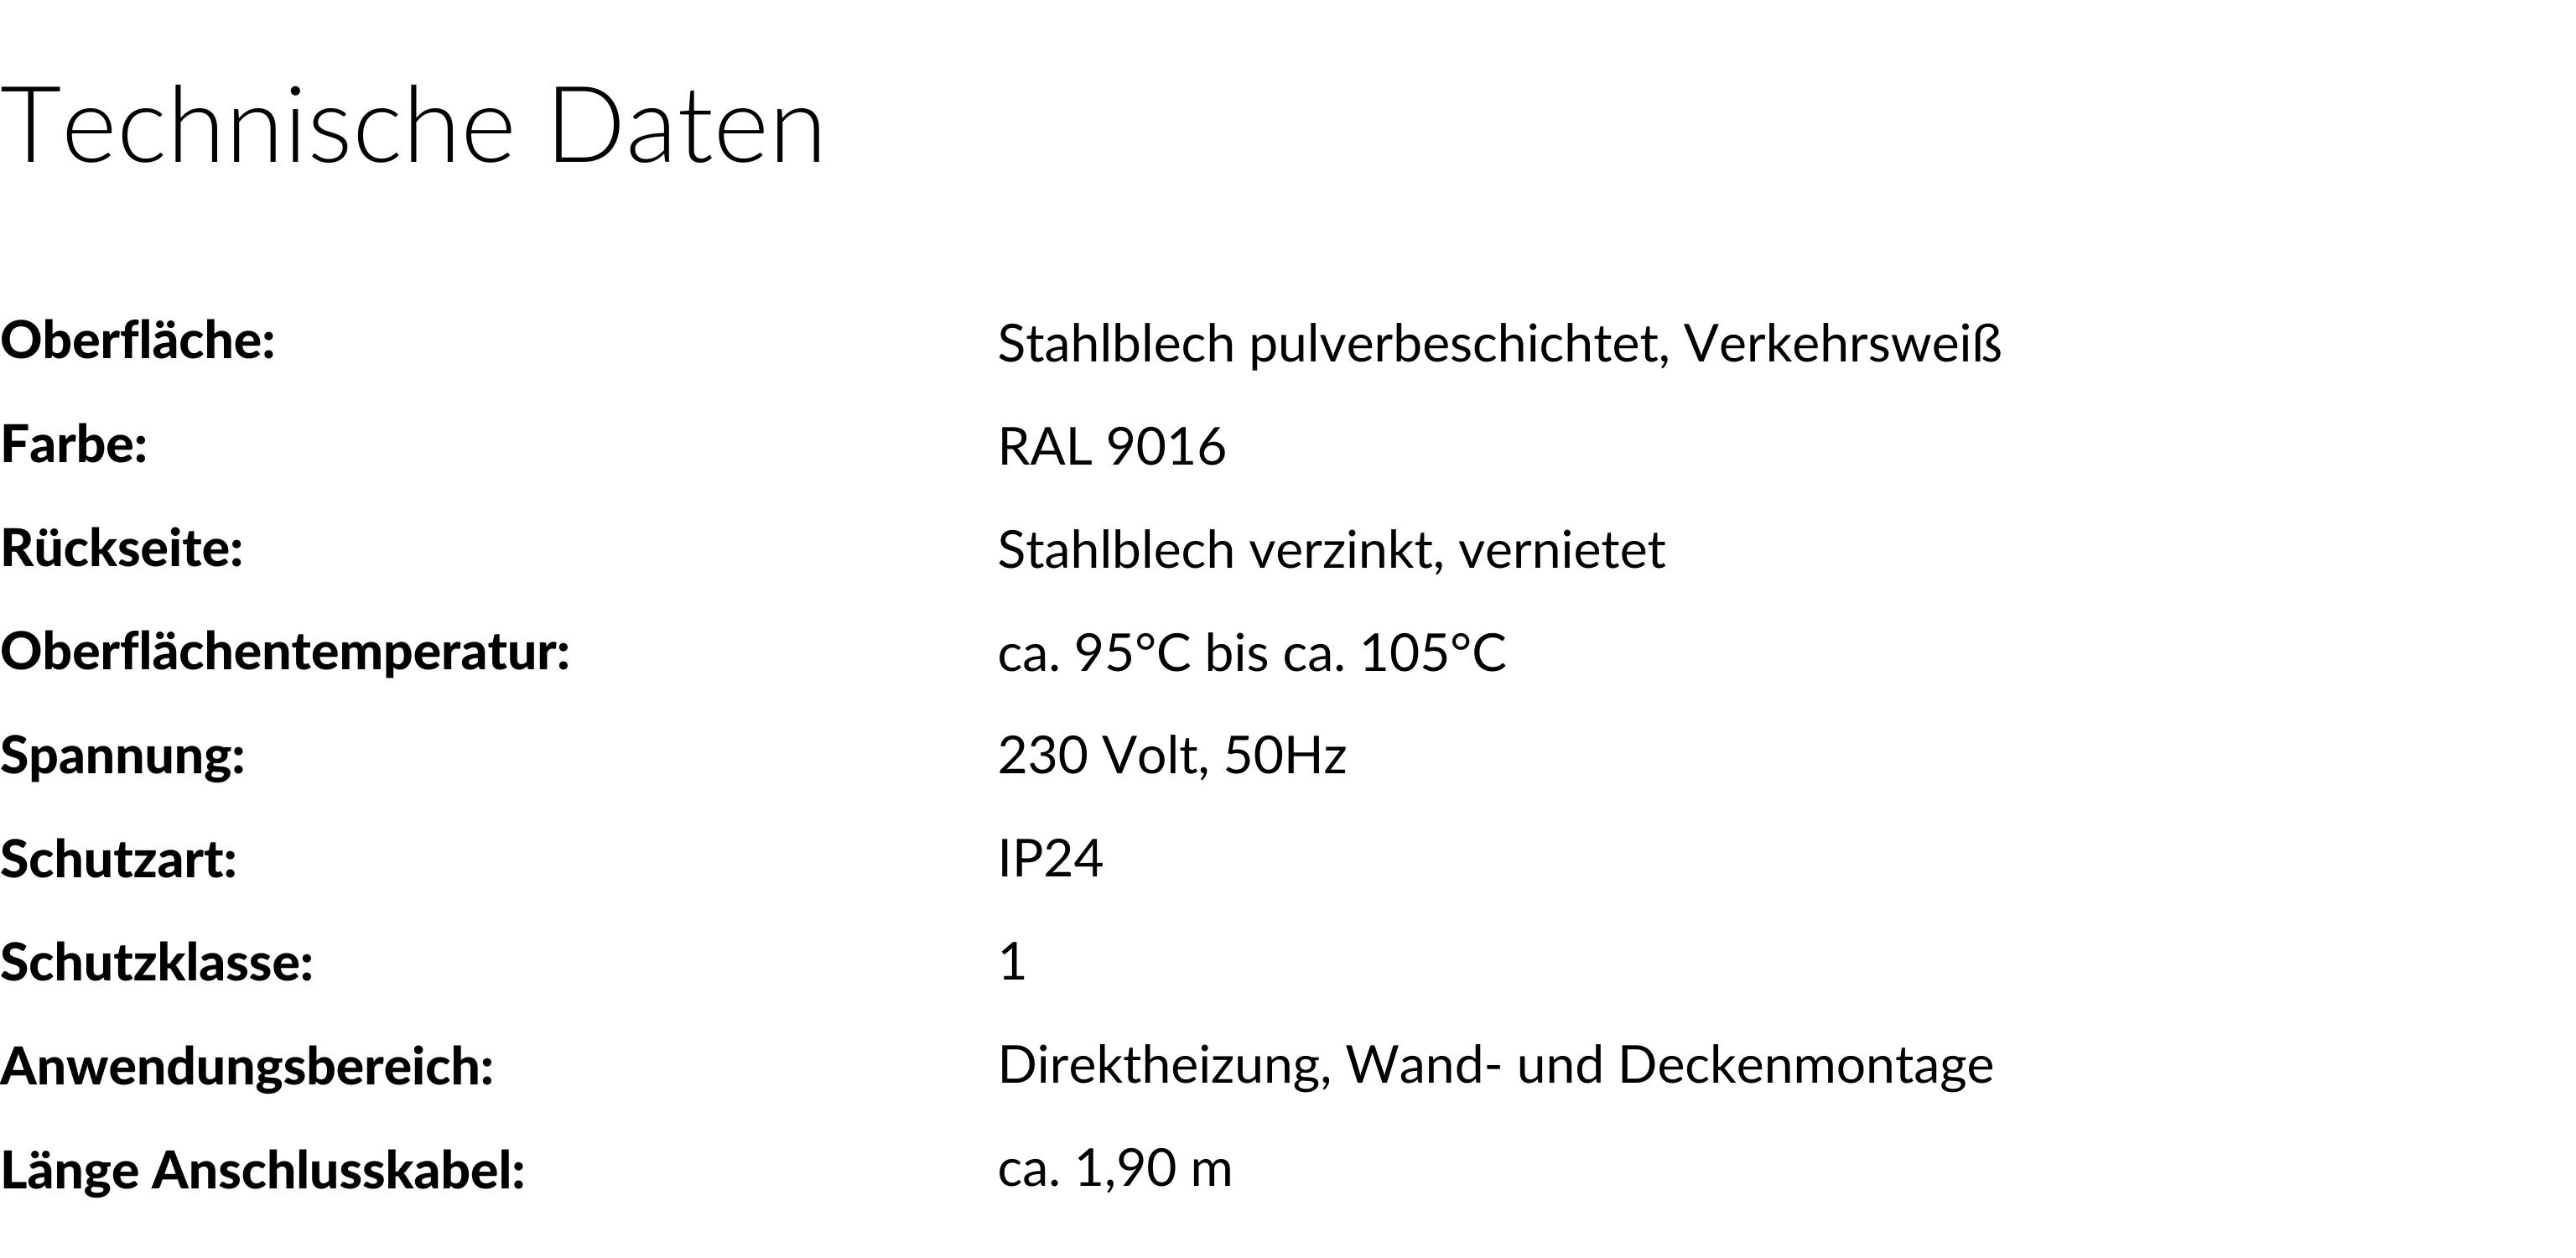 Technische_Daten_Metallheizung-5